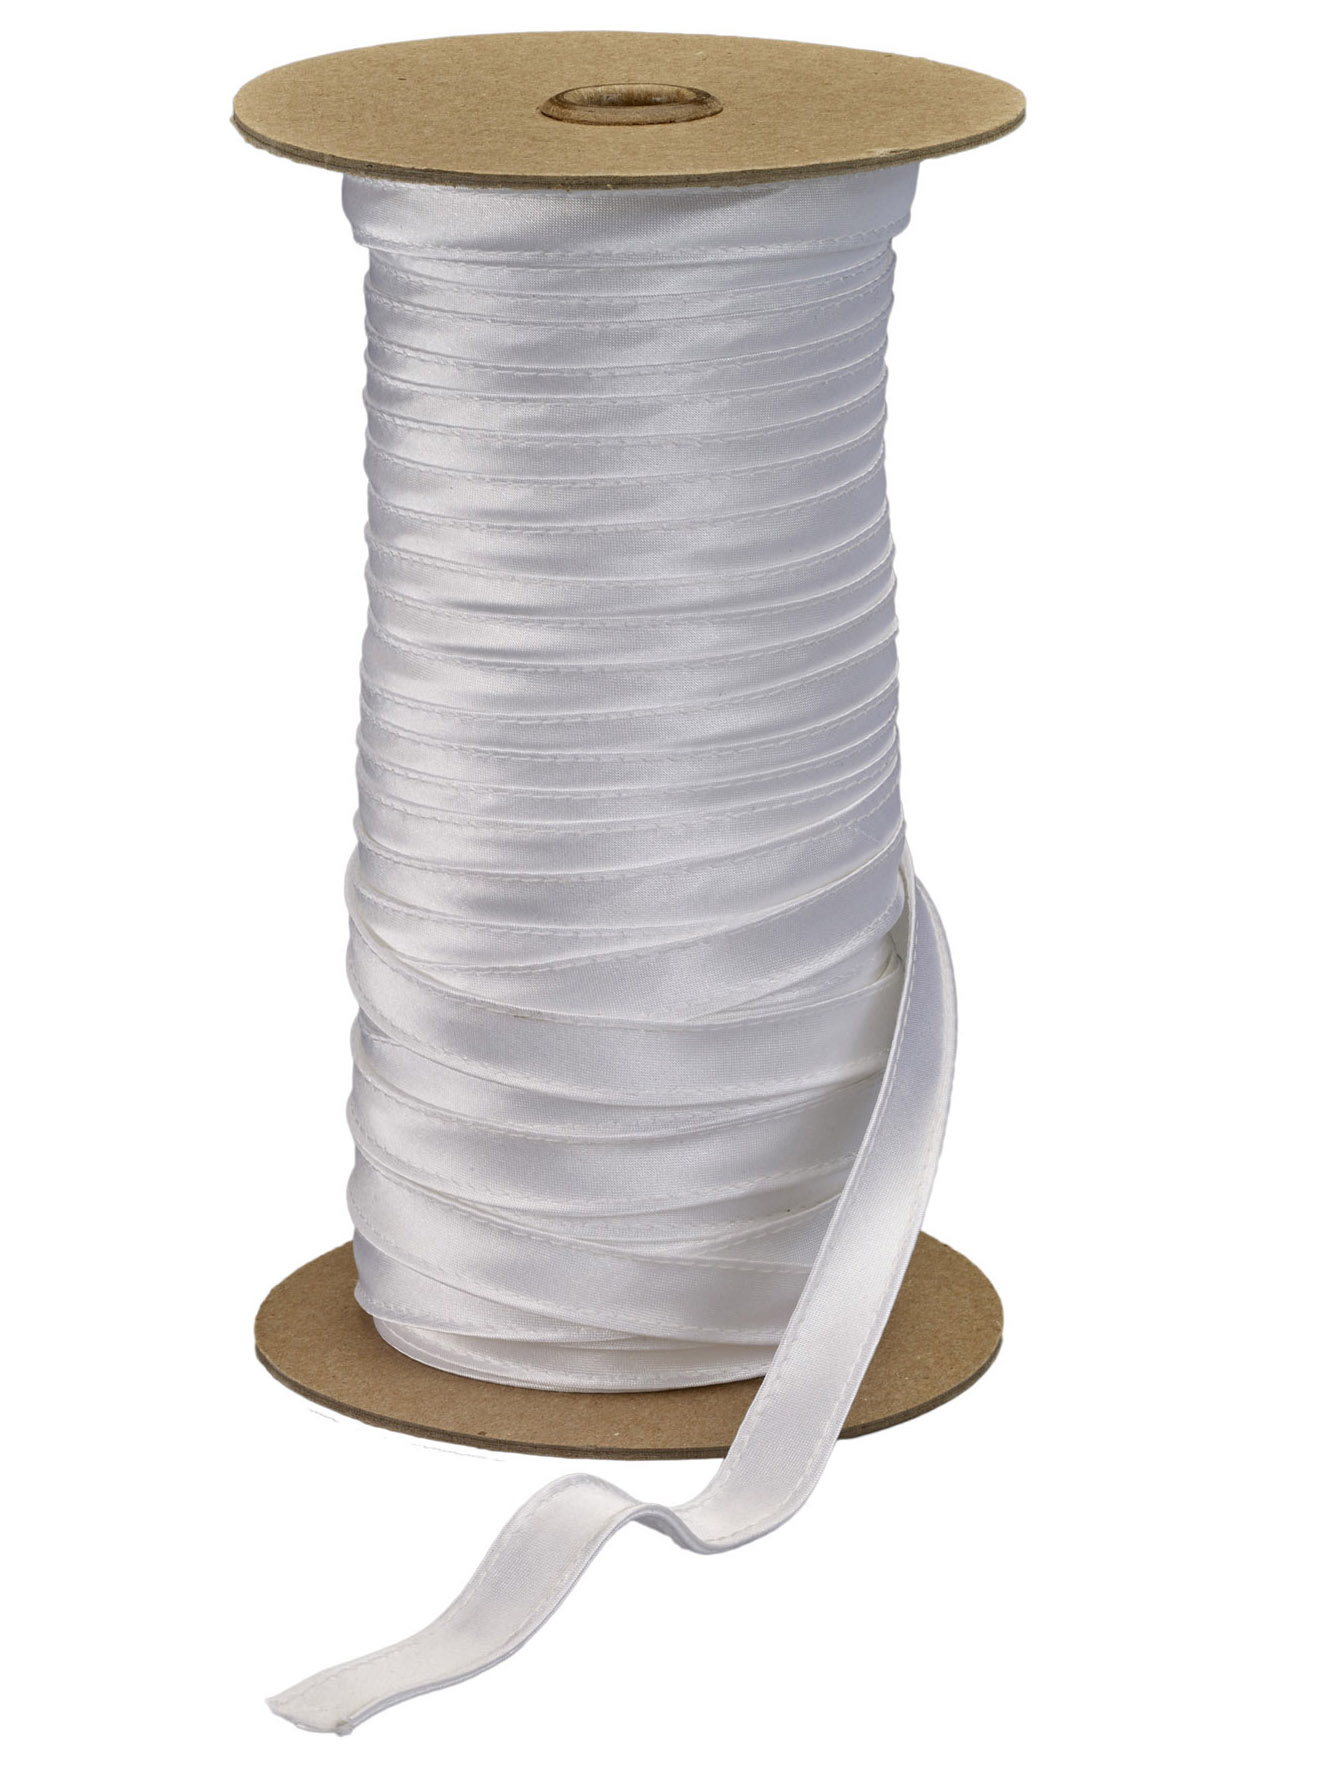 Stitched Satin Strap, Double-folded